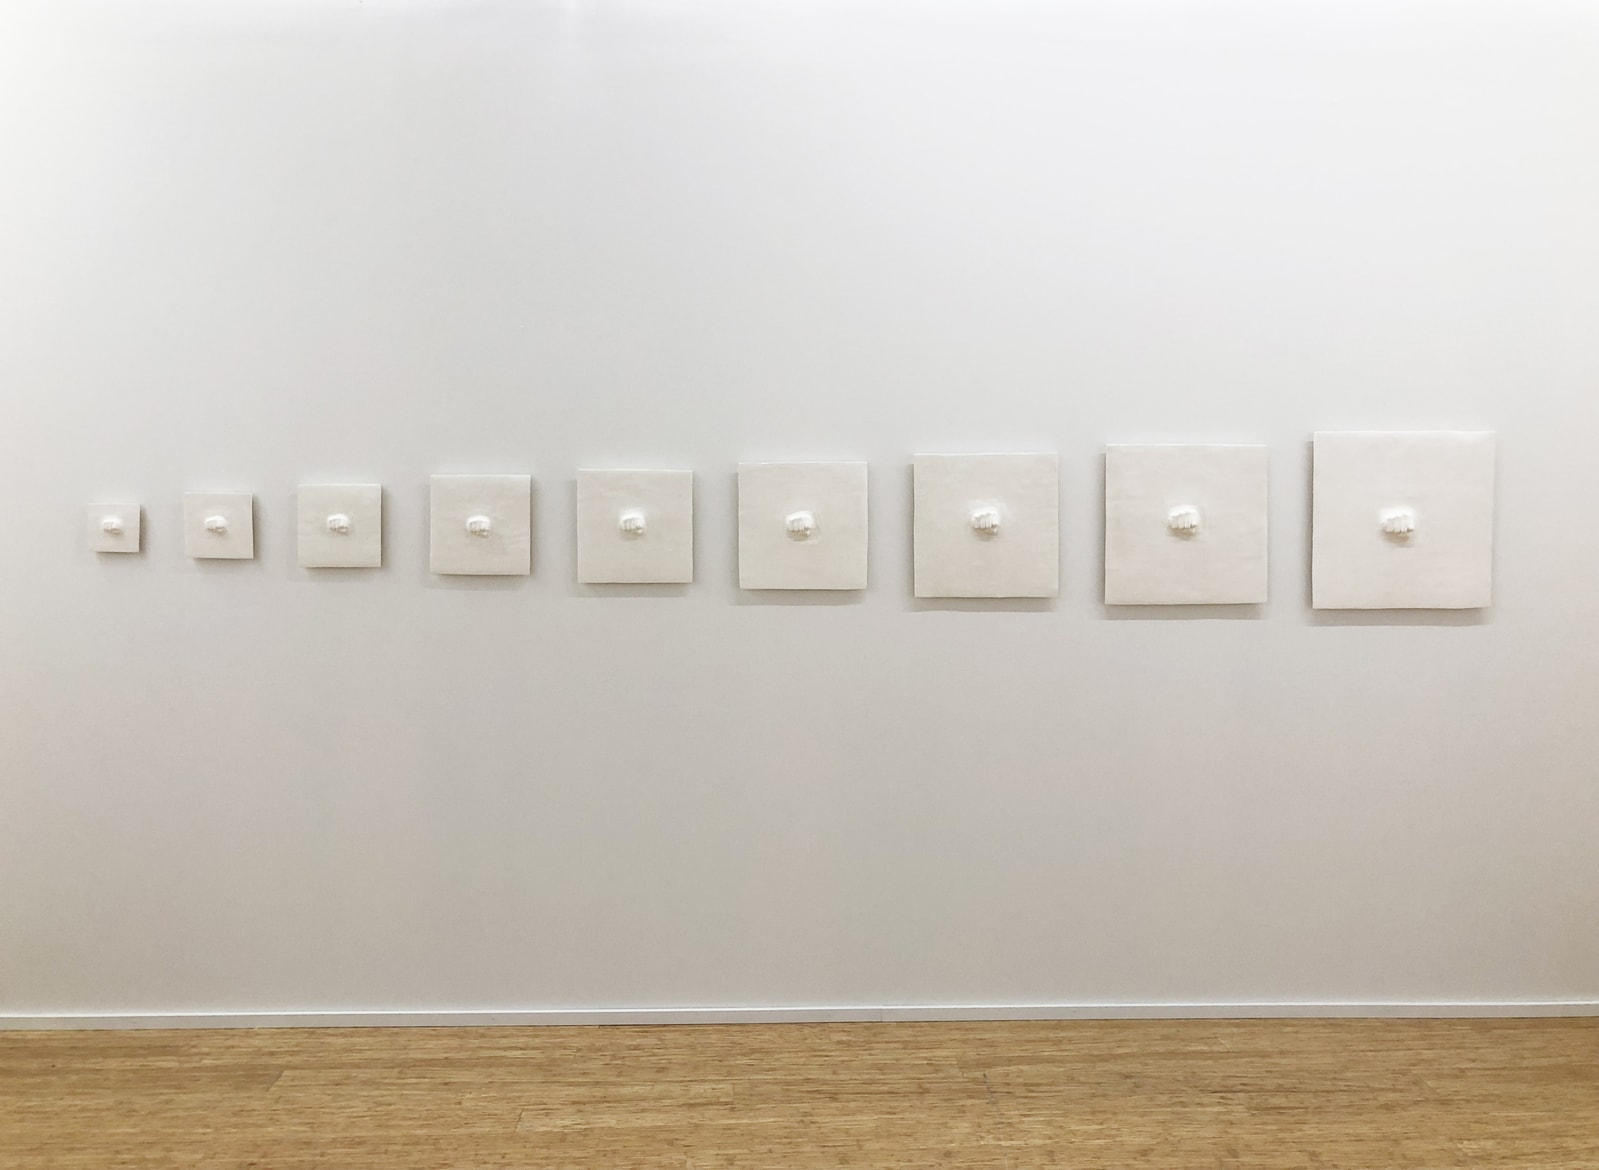 Liam Garstang, 'Psychic Whip', 2013, nine piece ceramic installation, overall 500 x 55 cm